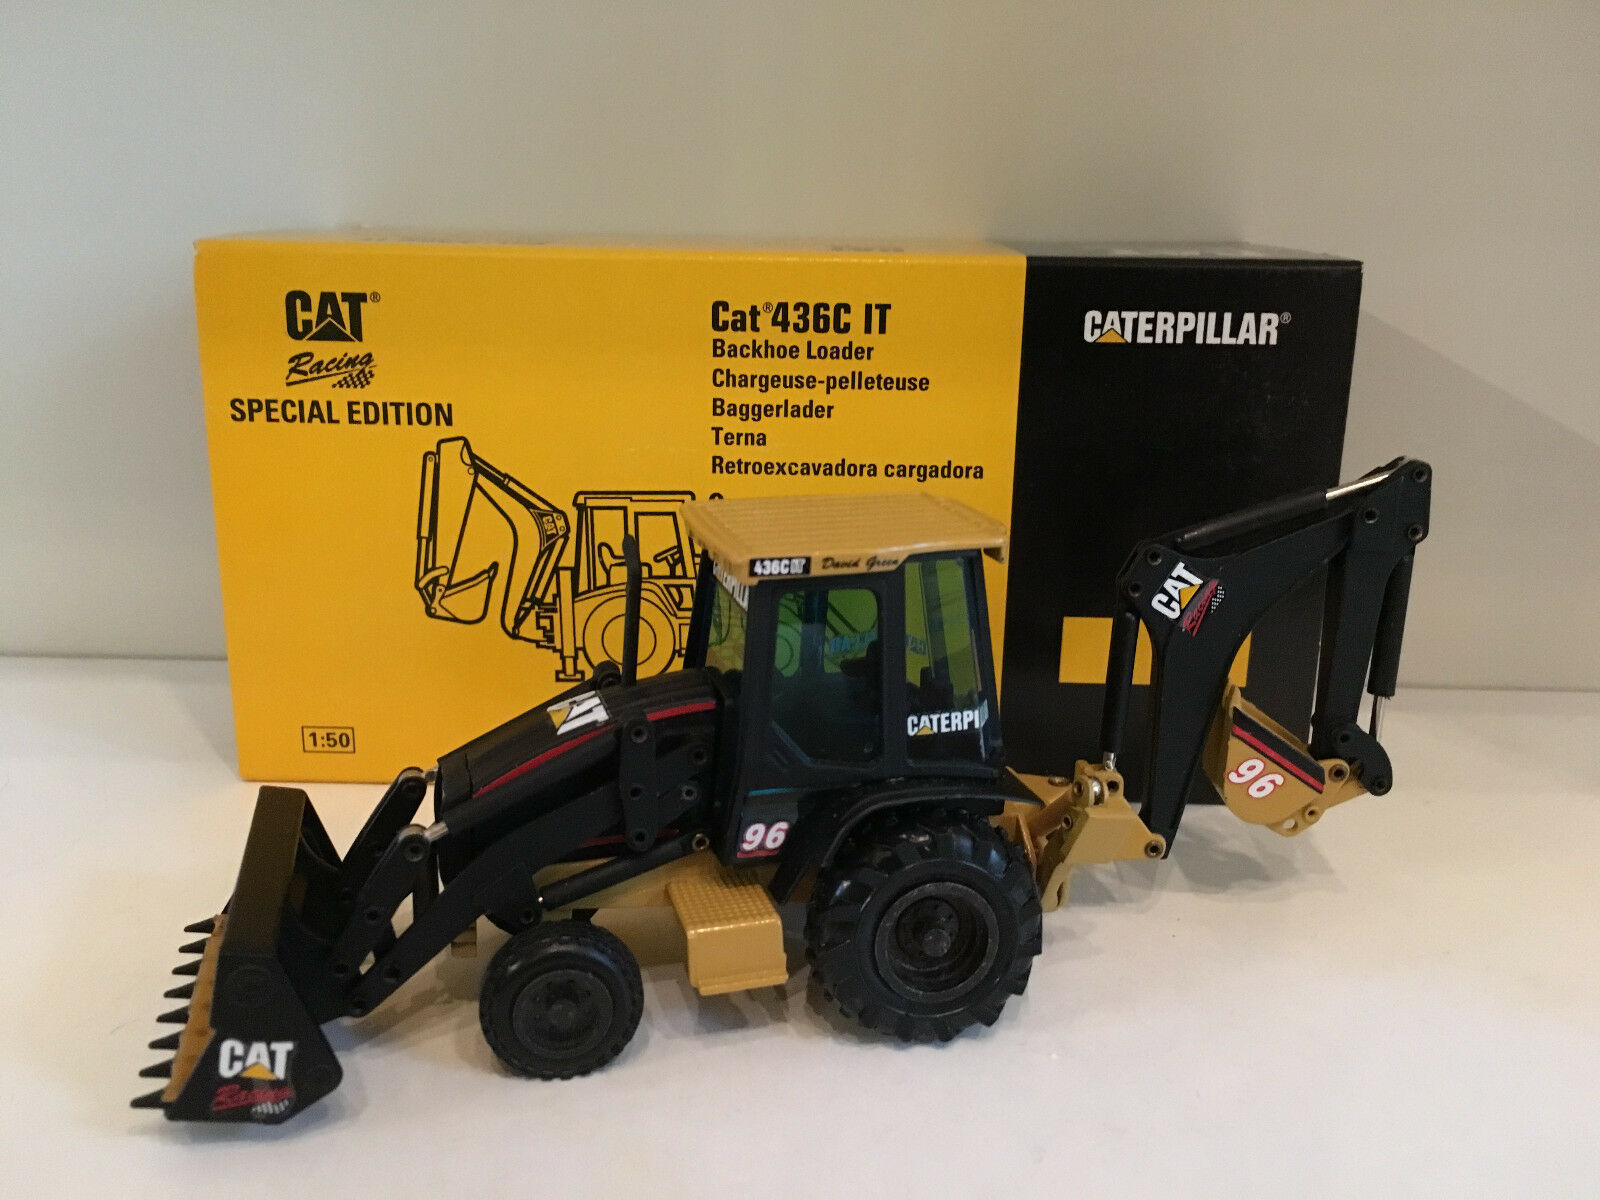 Caterpillar 436 C IT chargeuses-pelleteuses Racing Edition de NZG 429 01 1 50 Neuf Dans Sa Boîte